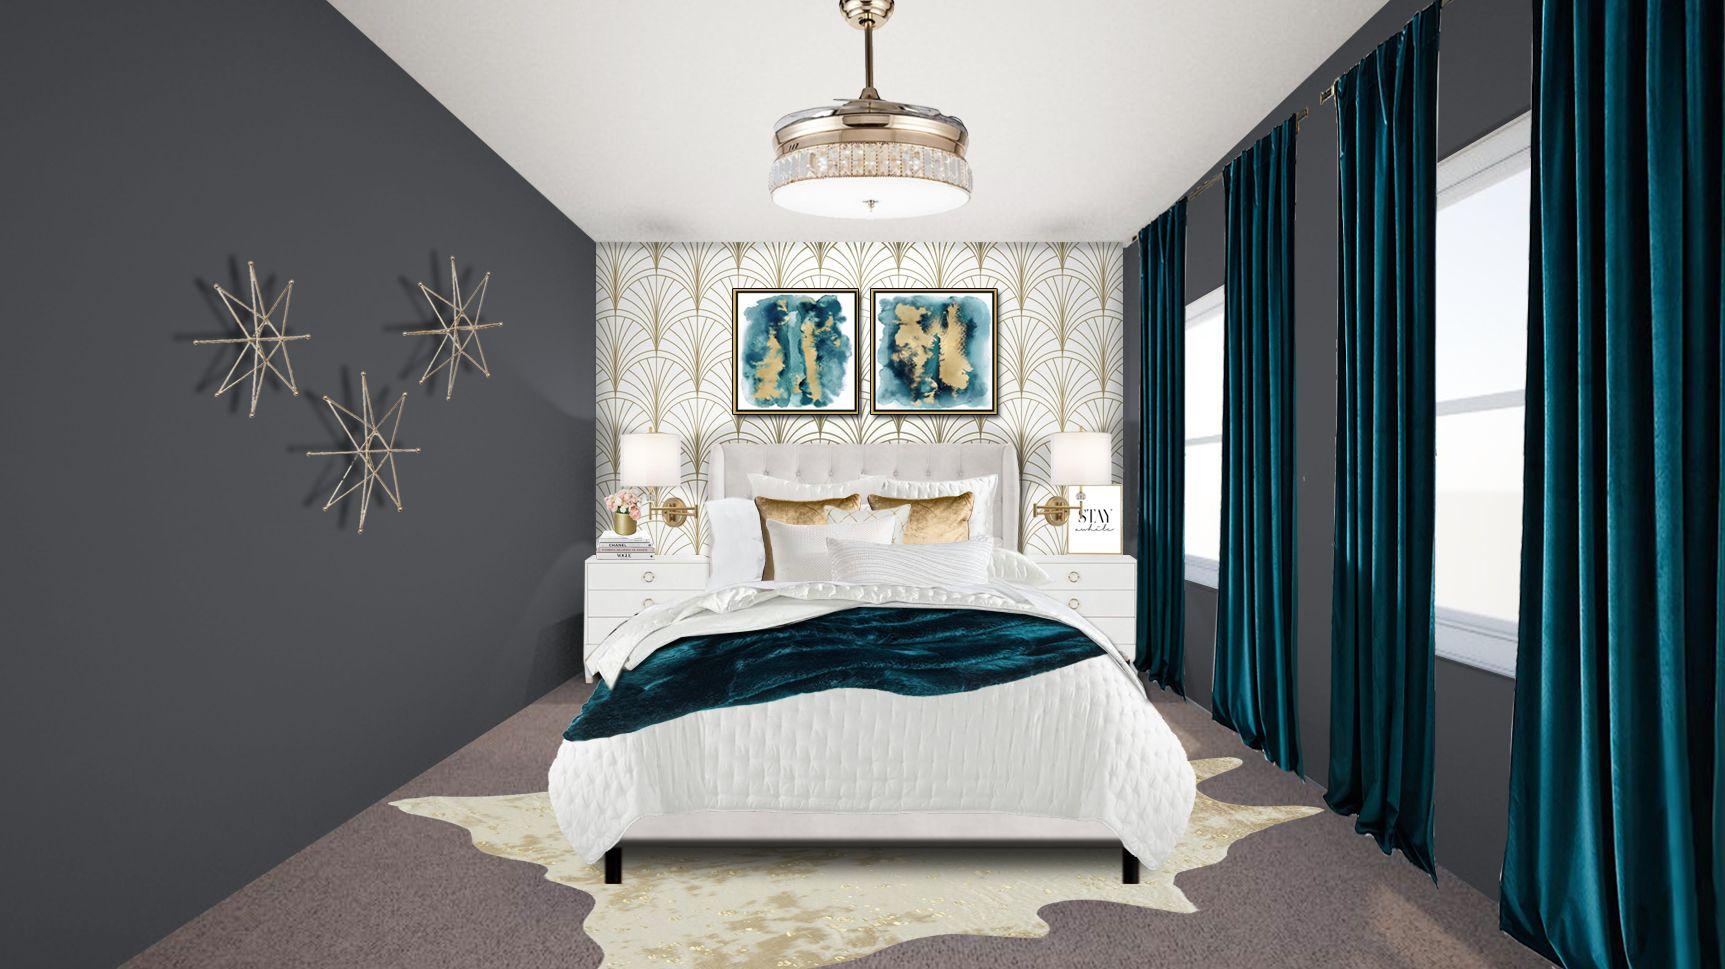 Modern Glam Guest Bedroom In 2020 Guest Bedroom Online Interior Design Interior Design